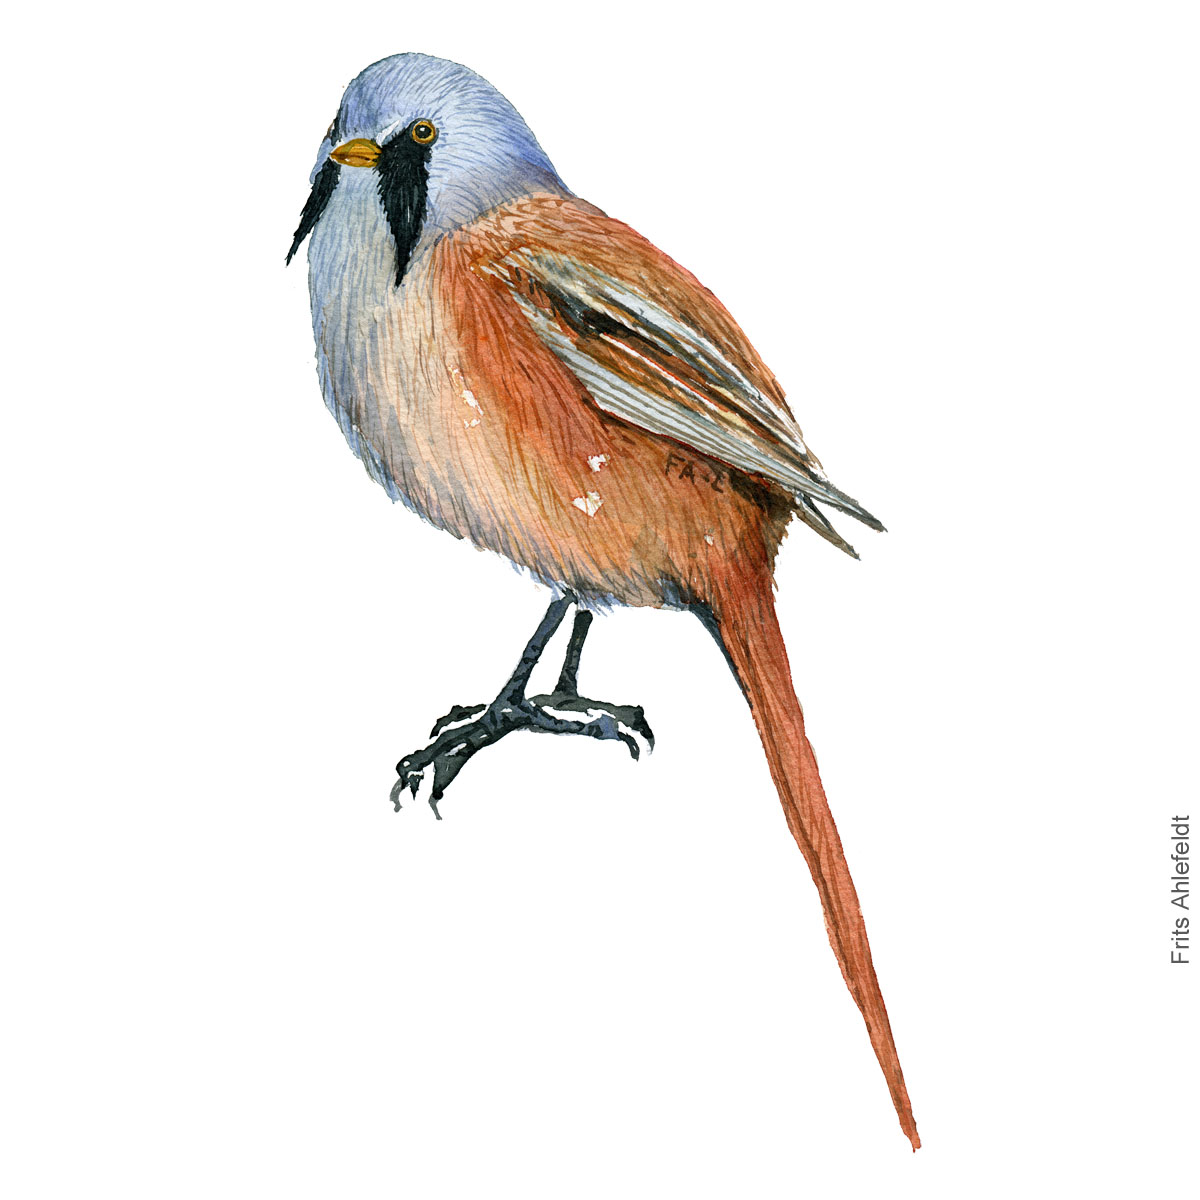 Skaegmejse - Bearded reedling - Bird painting in watercolor by Frits Ahlefeldt - Fugle akvarel